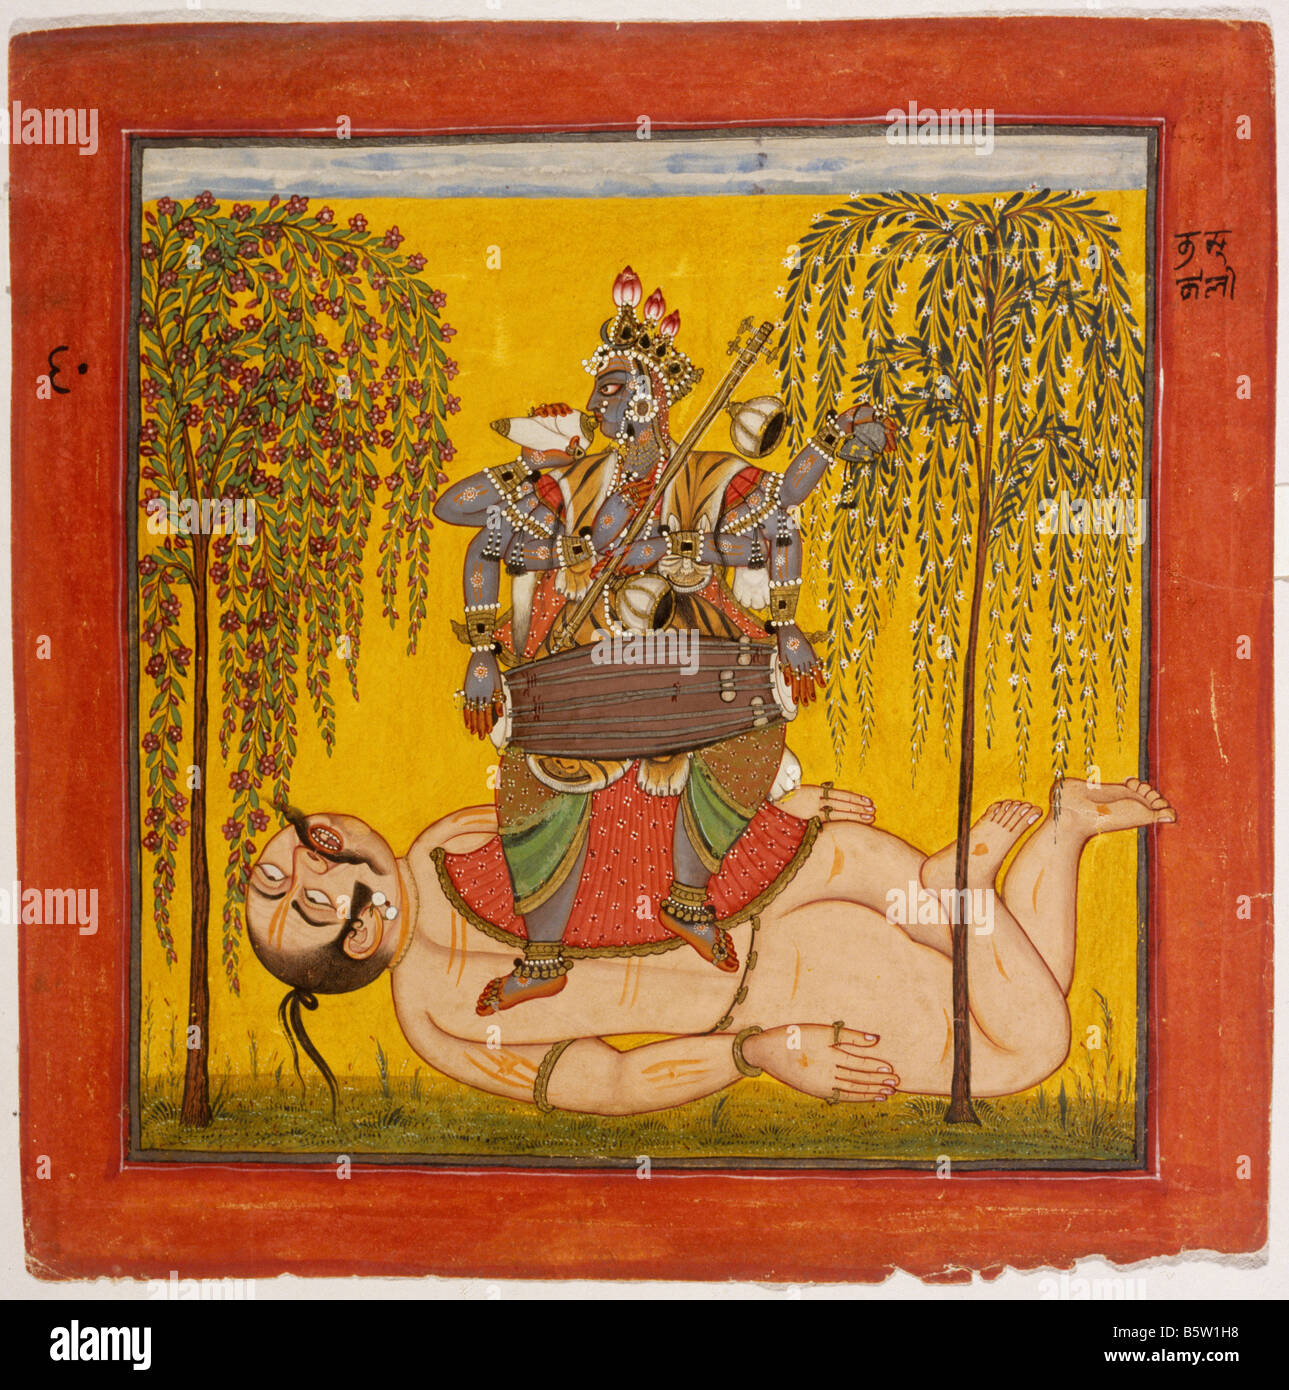 Great Wallpaper Lord Bhadrakali - bhadrakali-tantric-text-basohli-c-1700-hill-school-of-painting-national-B5W1H8  Image_569312.jpg